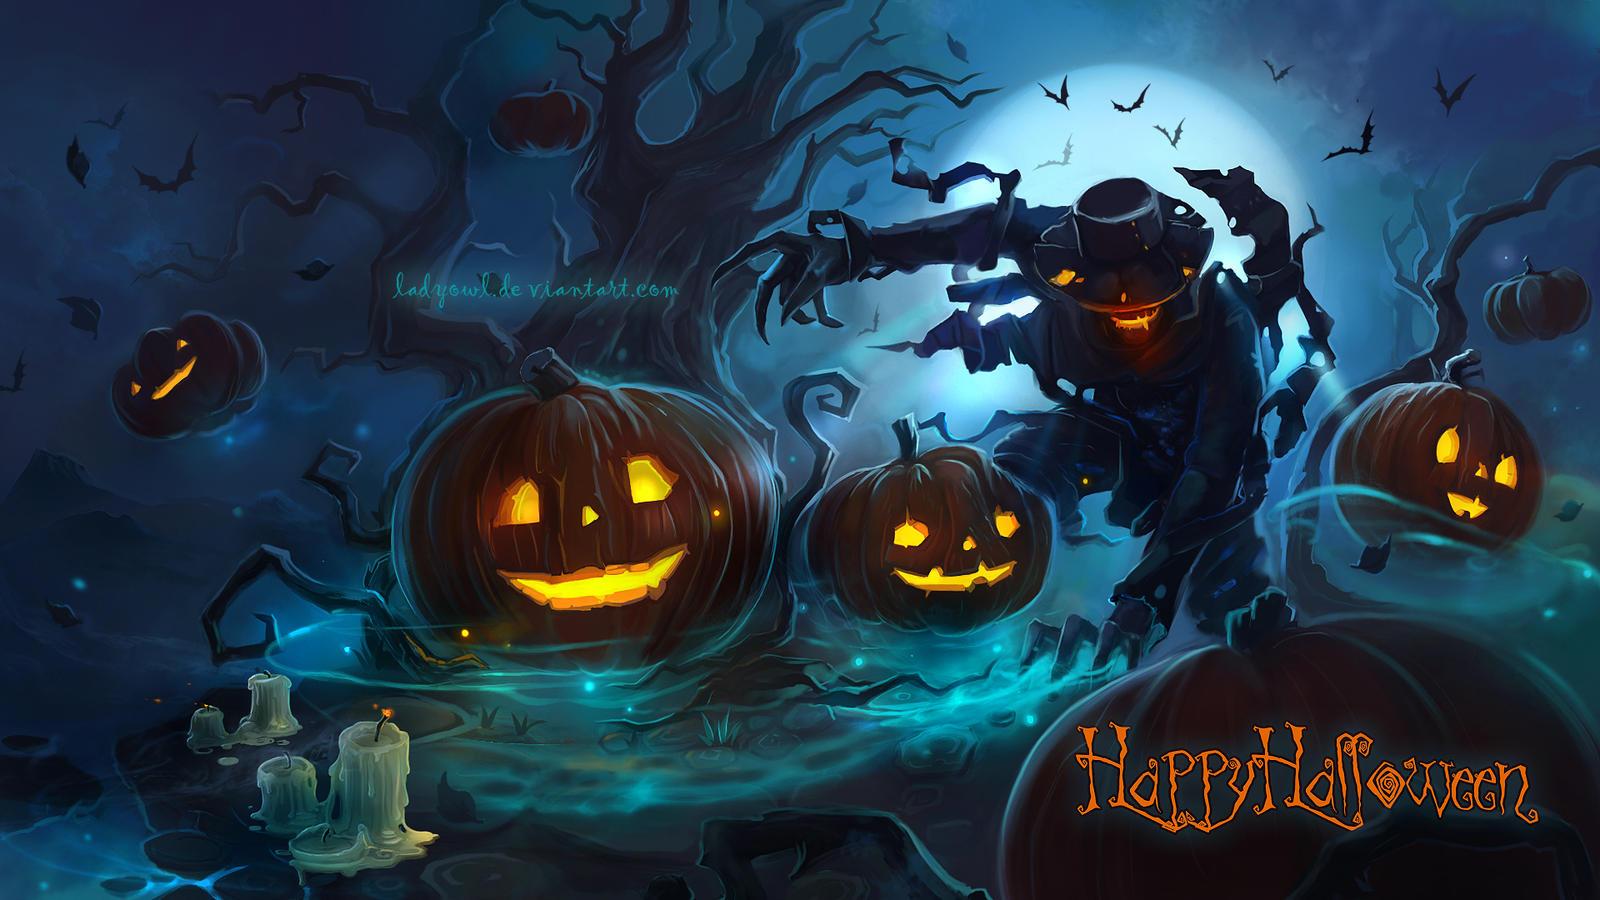 Halloween2015 by LadyOwl